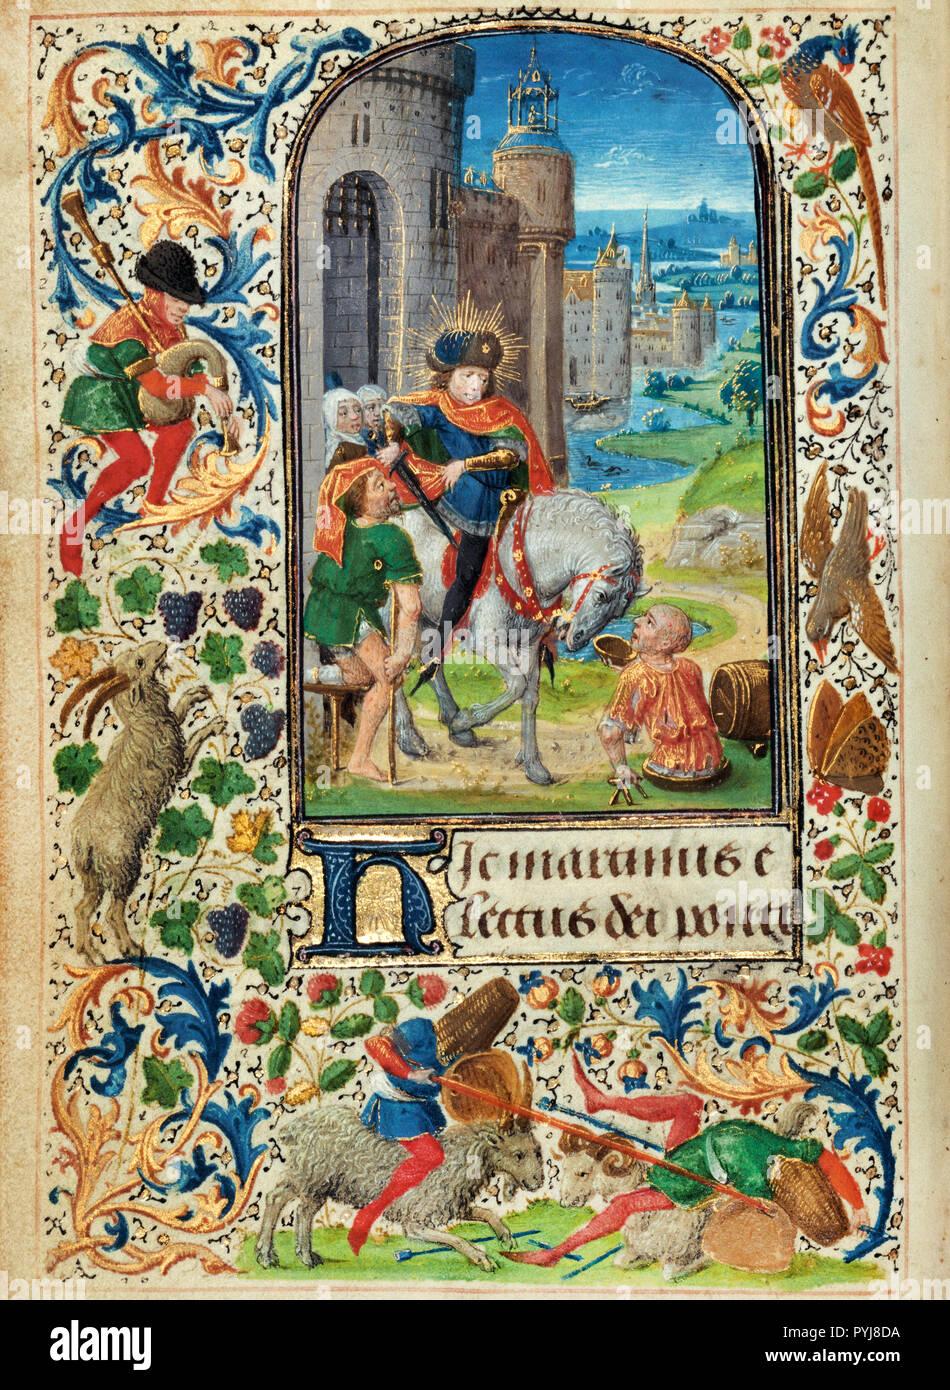 Lieven van Lathem, Saint Martin Dividing his Cloak 1469 Tempera colors, gold leaf, gold, silver, ink on parchment, The J. Paul Getty Museum, Los Angeles, USA. - Stock Image